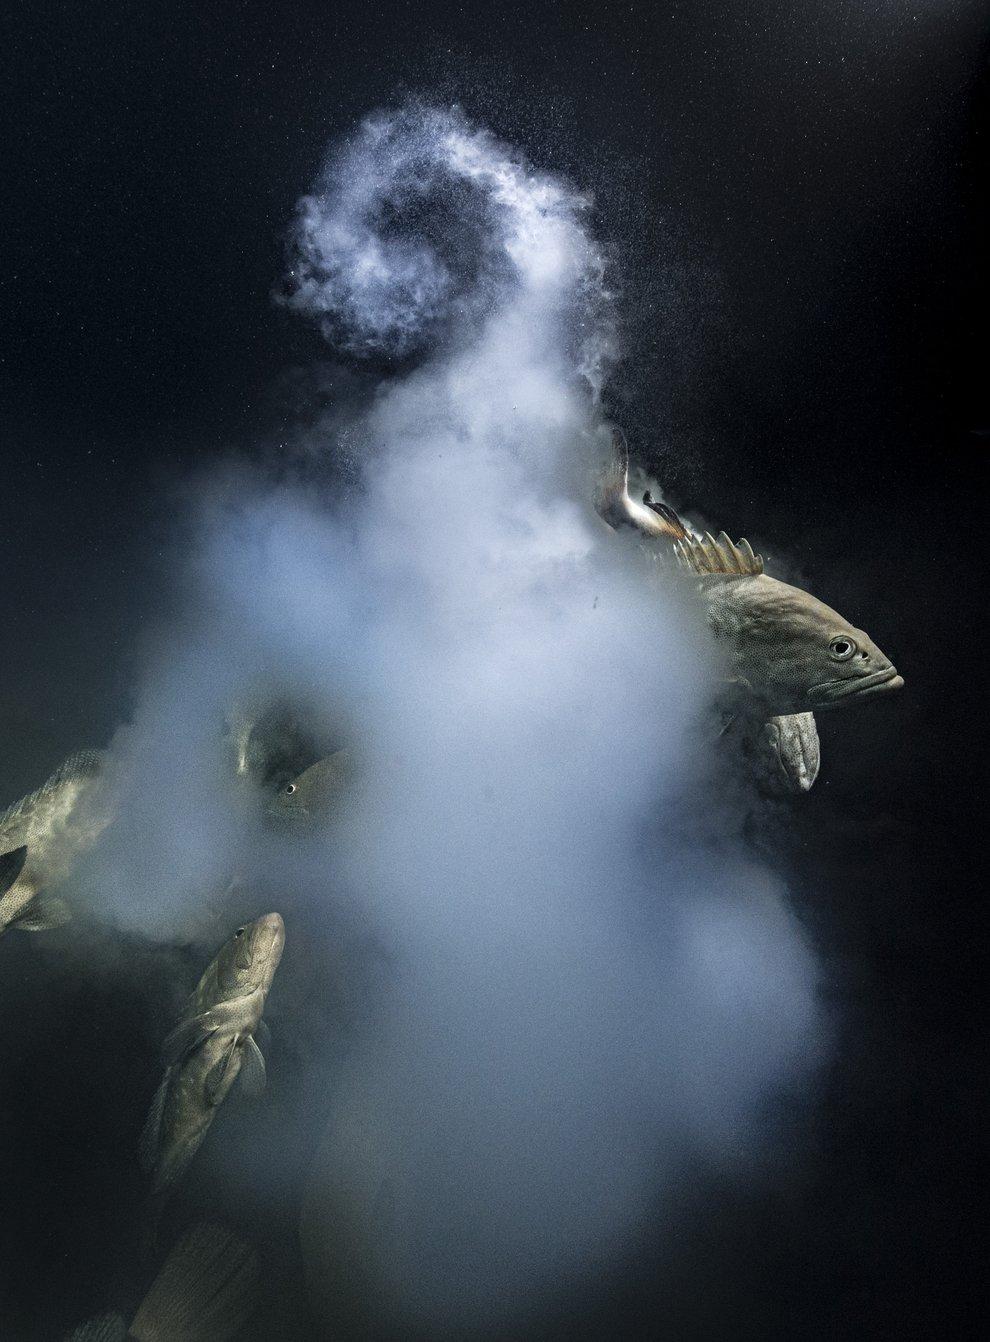 (Laurent Ballesta/Wildlife Photographer of the Year)